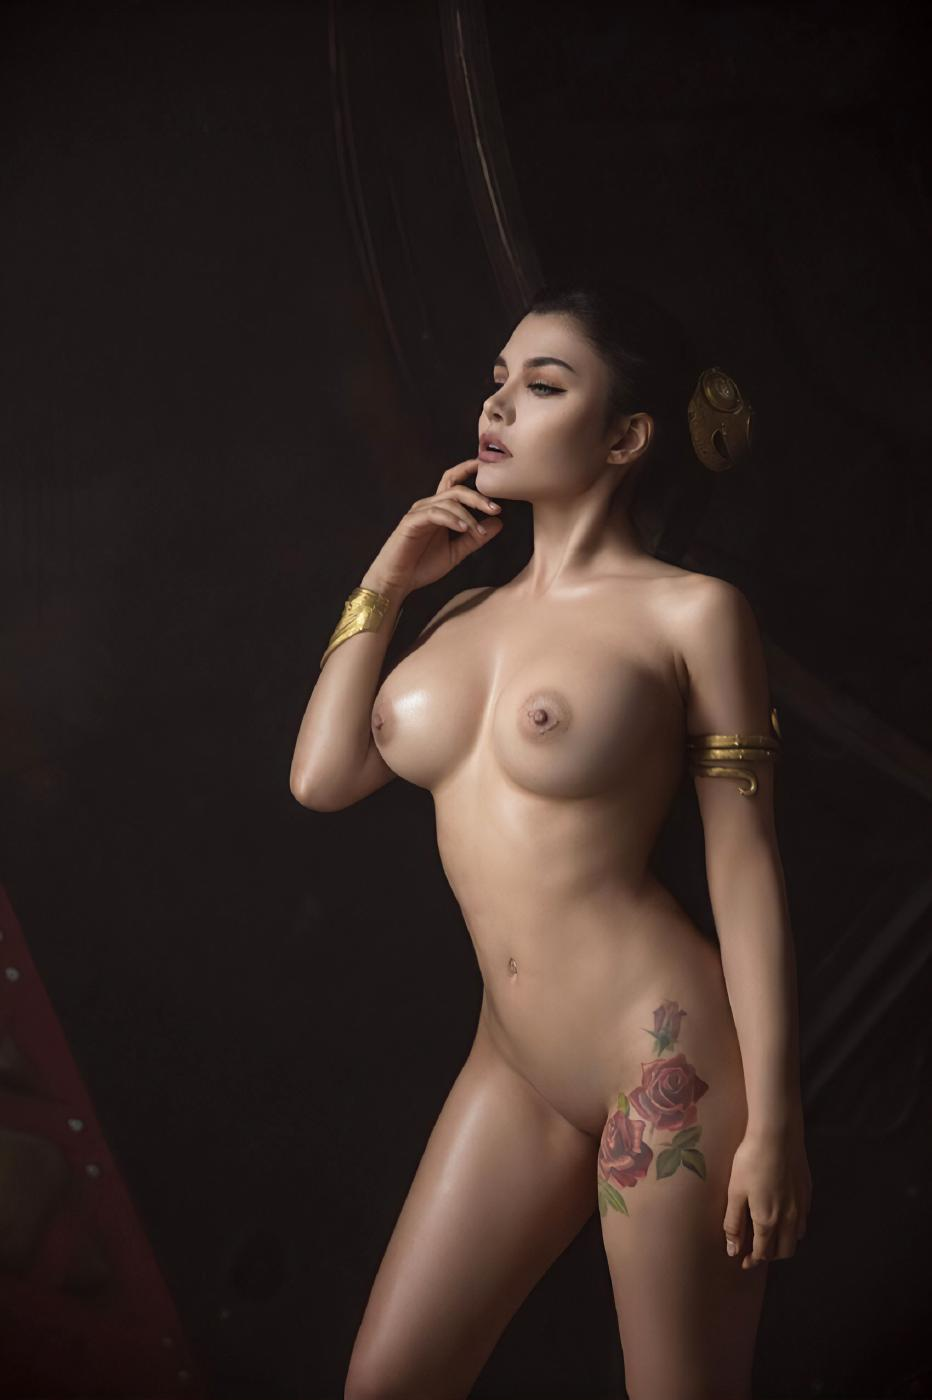 Kalinka Fox Nude Princess Leia Cosplay Set Leaked Xkkxdl